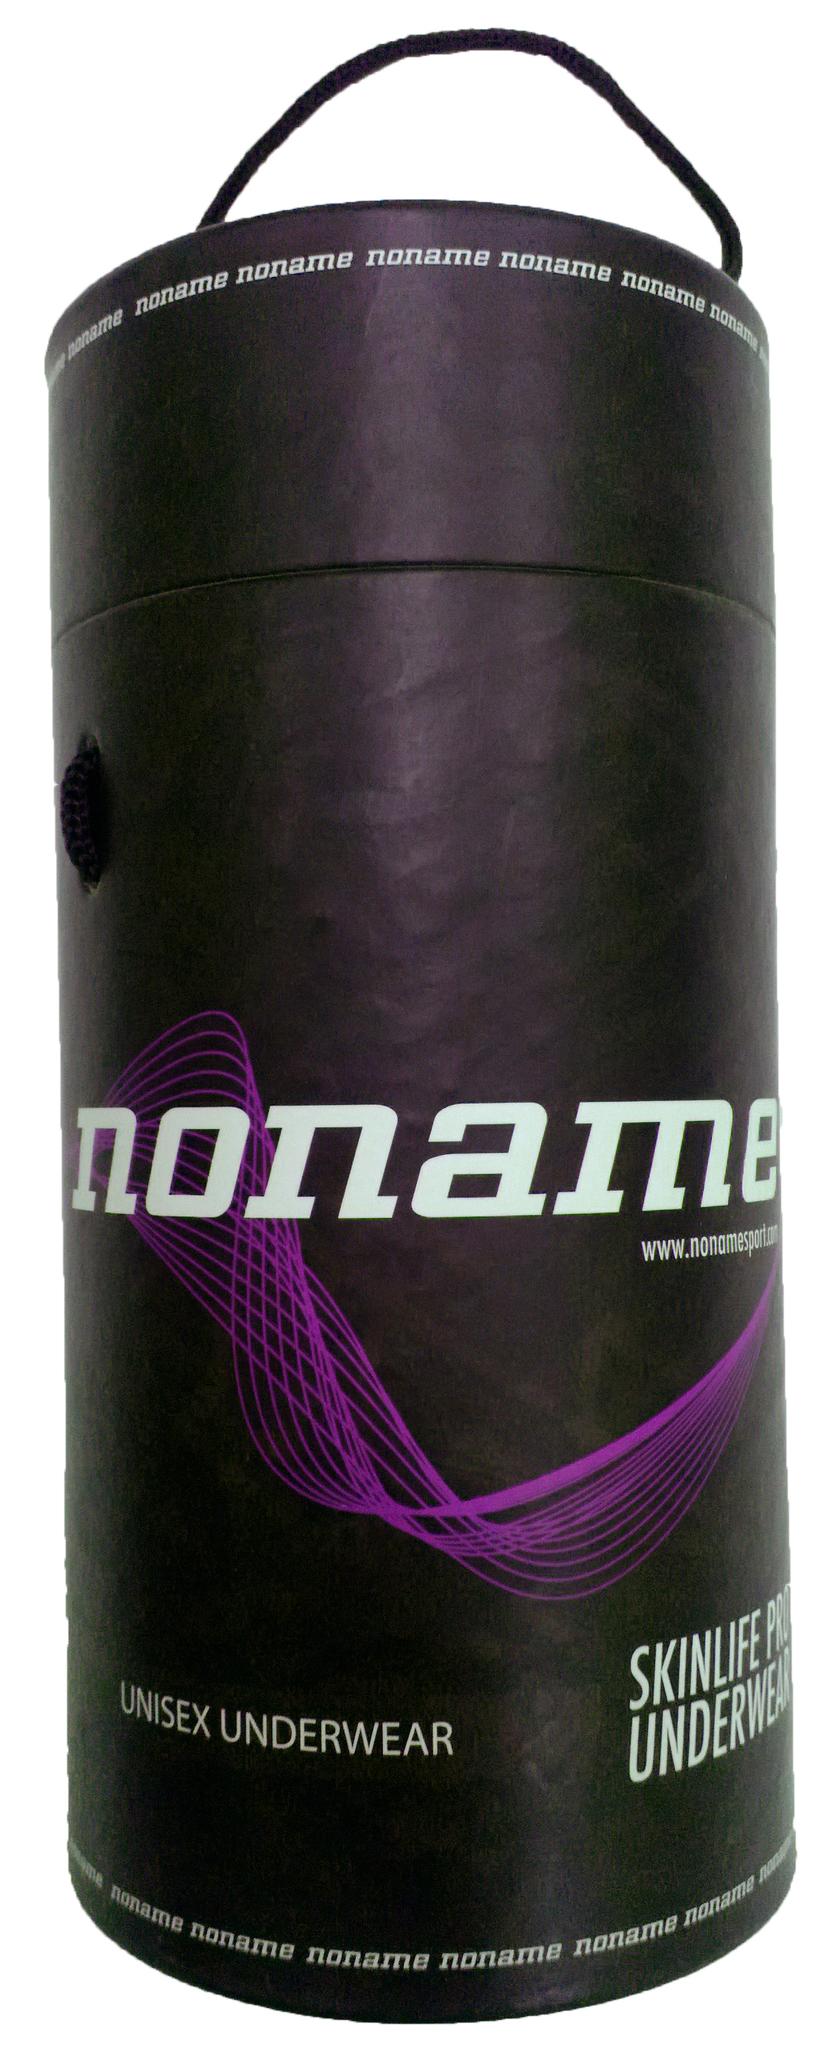 fe4cbbb0b158 Комплект термобелья Noname Skinlife Purple 13/14 женский - SkiRunner.ru